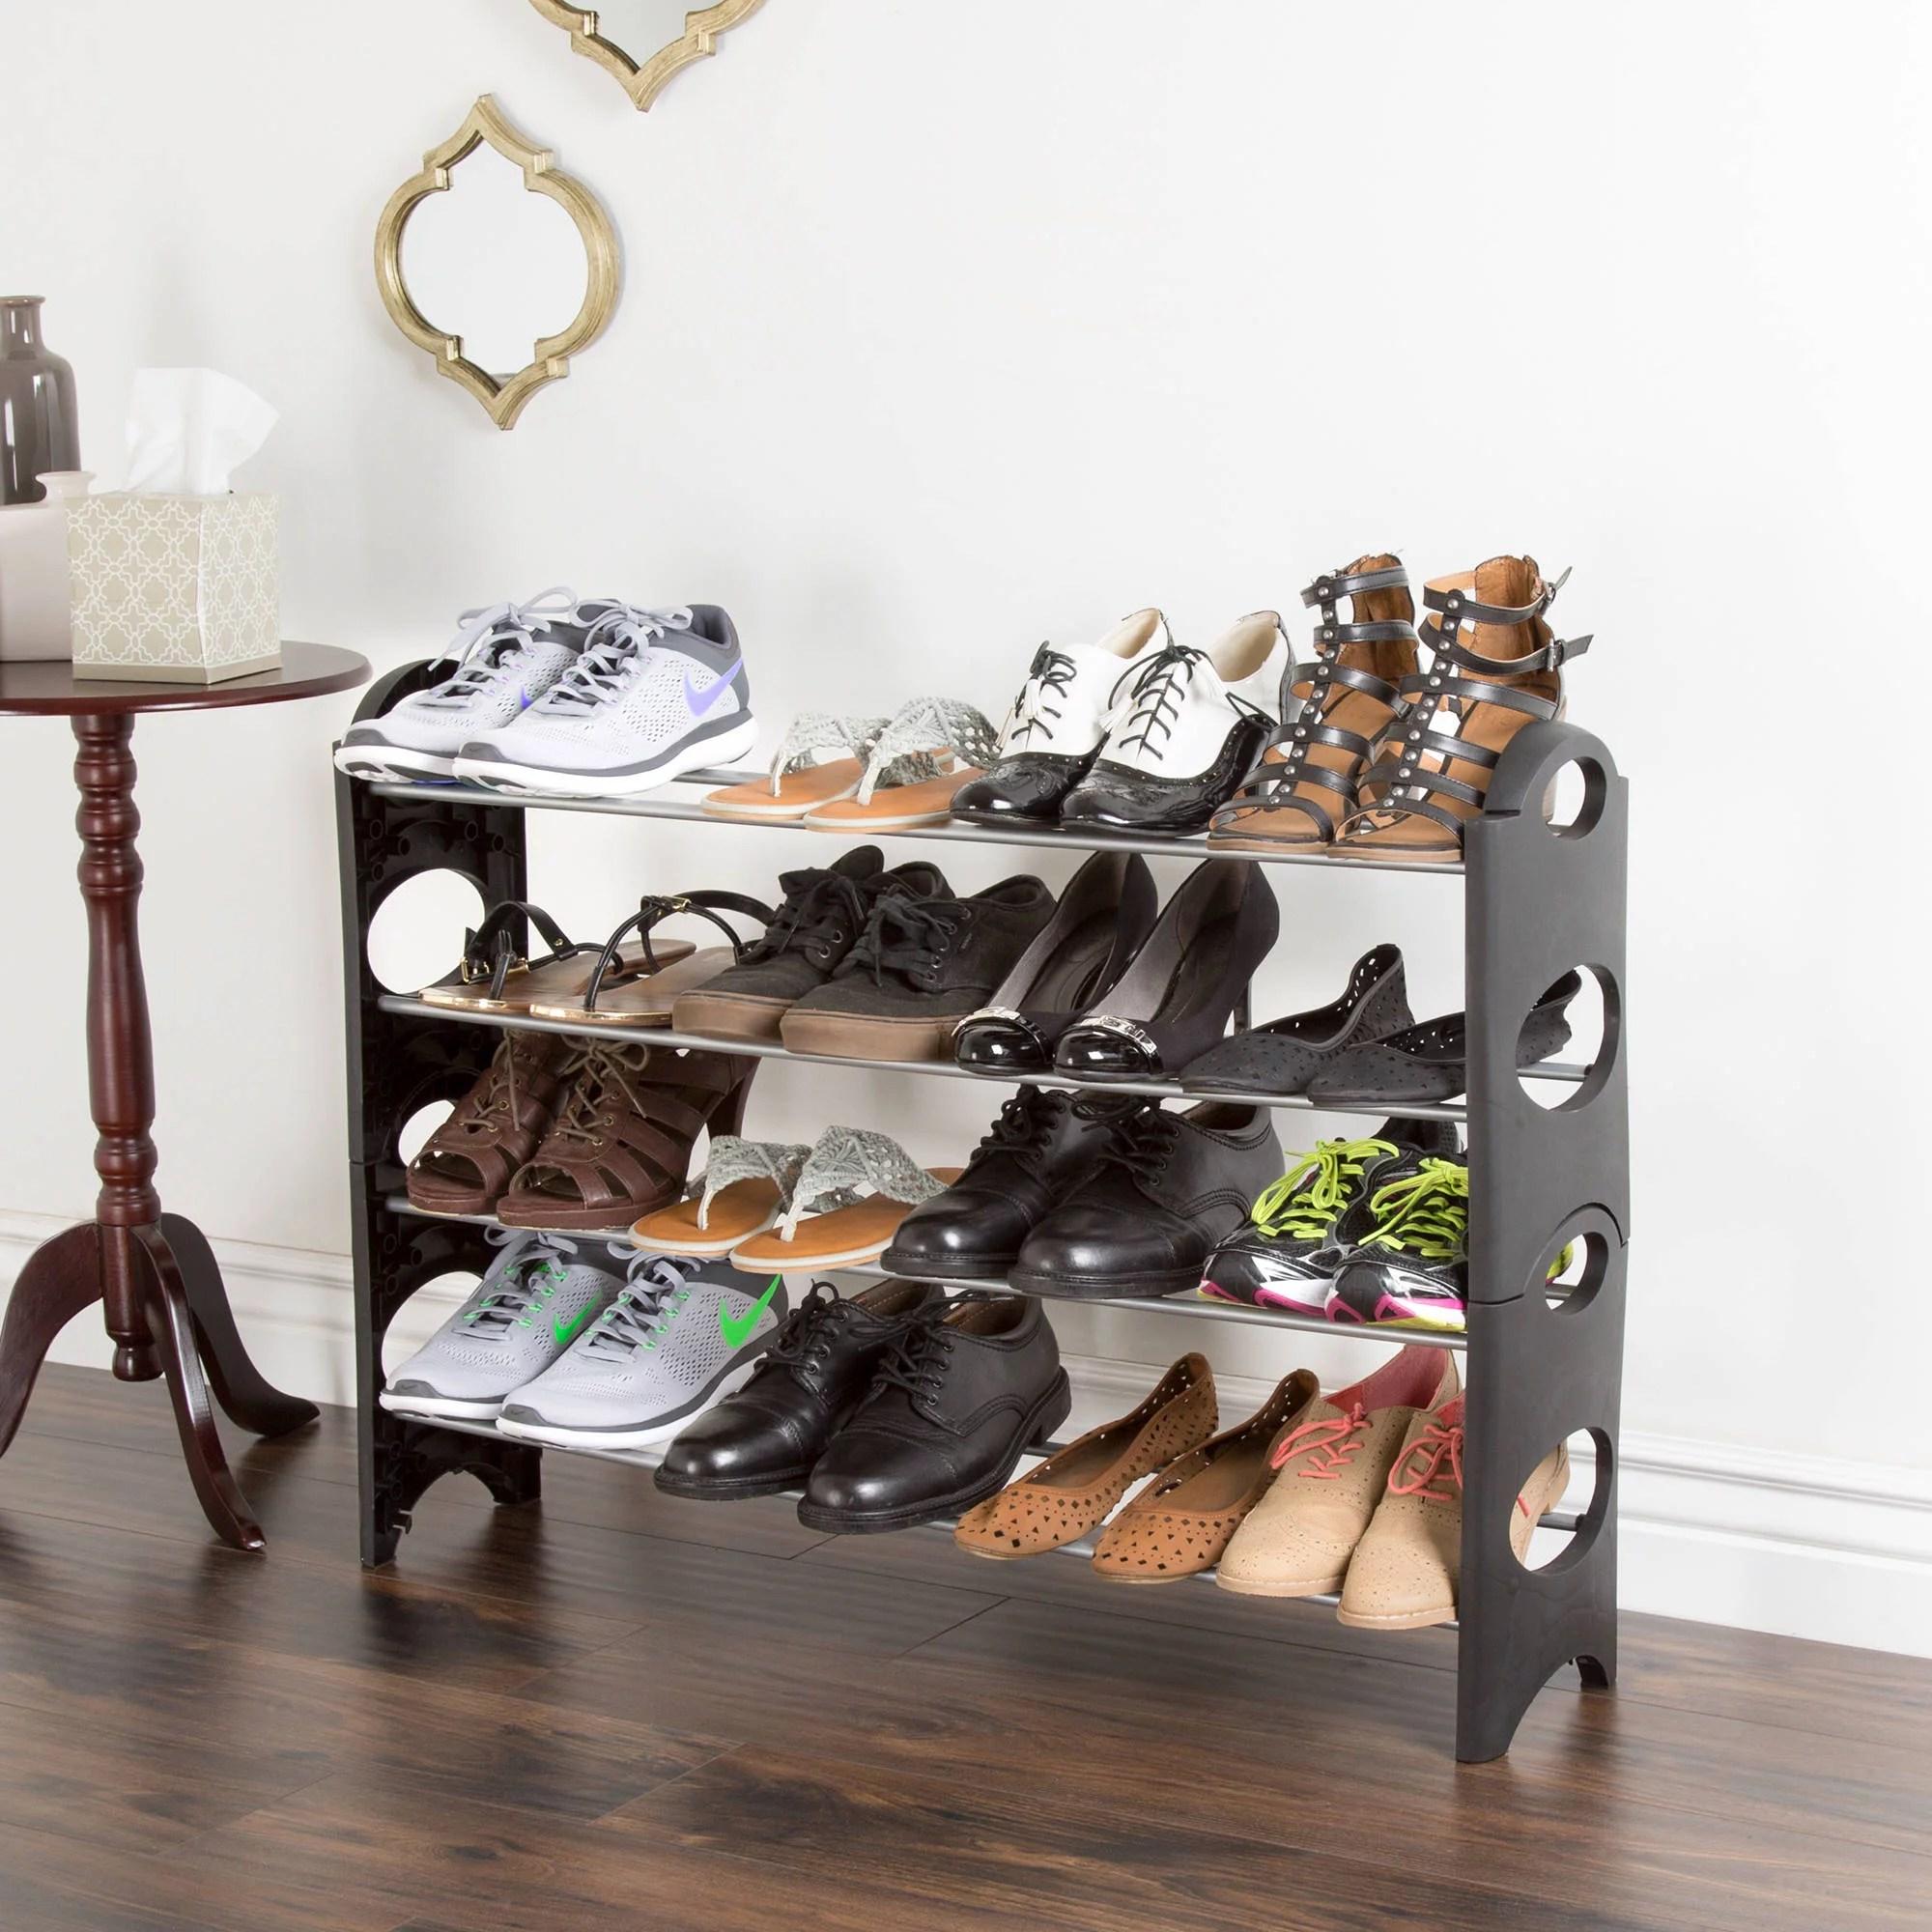 Shoe Rack, Stackable Storage Bench ? Closet, Bathroom ... on Closet Space Savers Walmart  id=62193